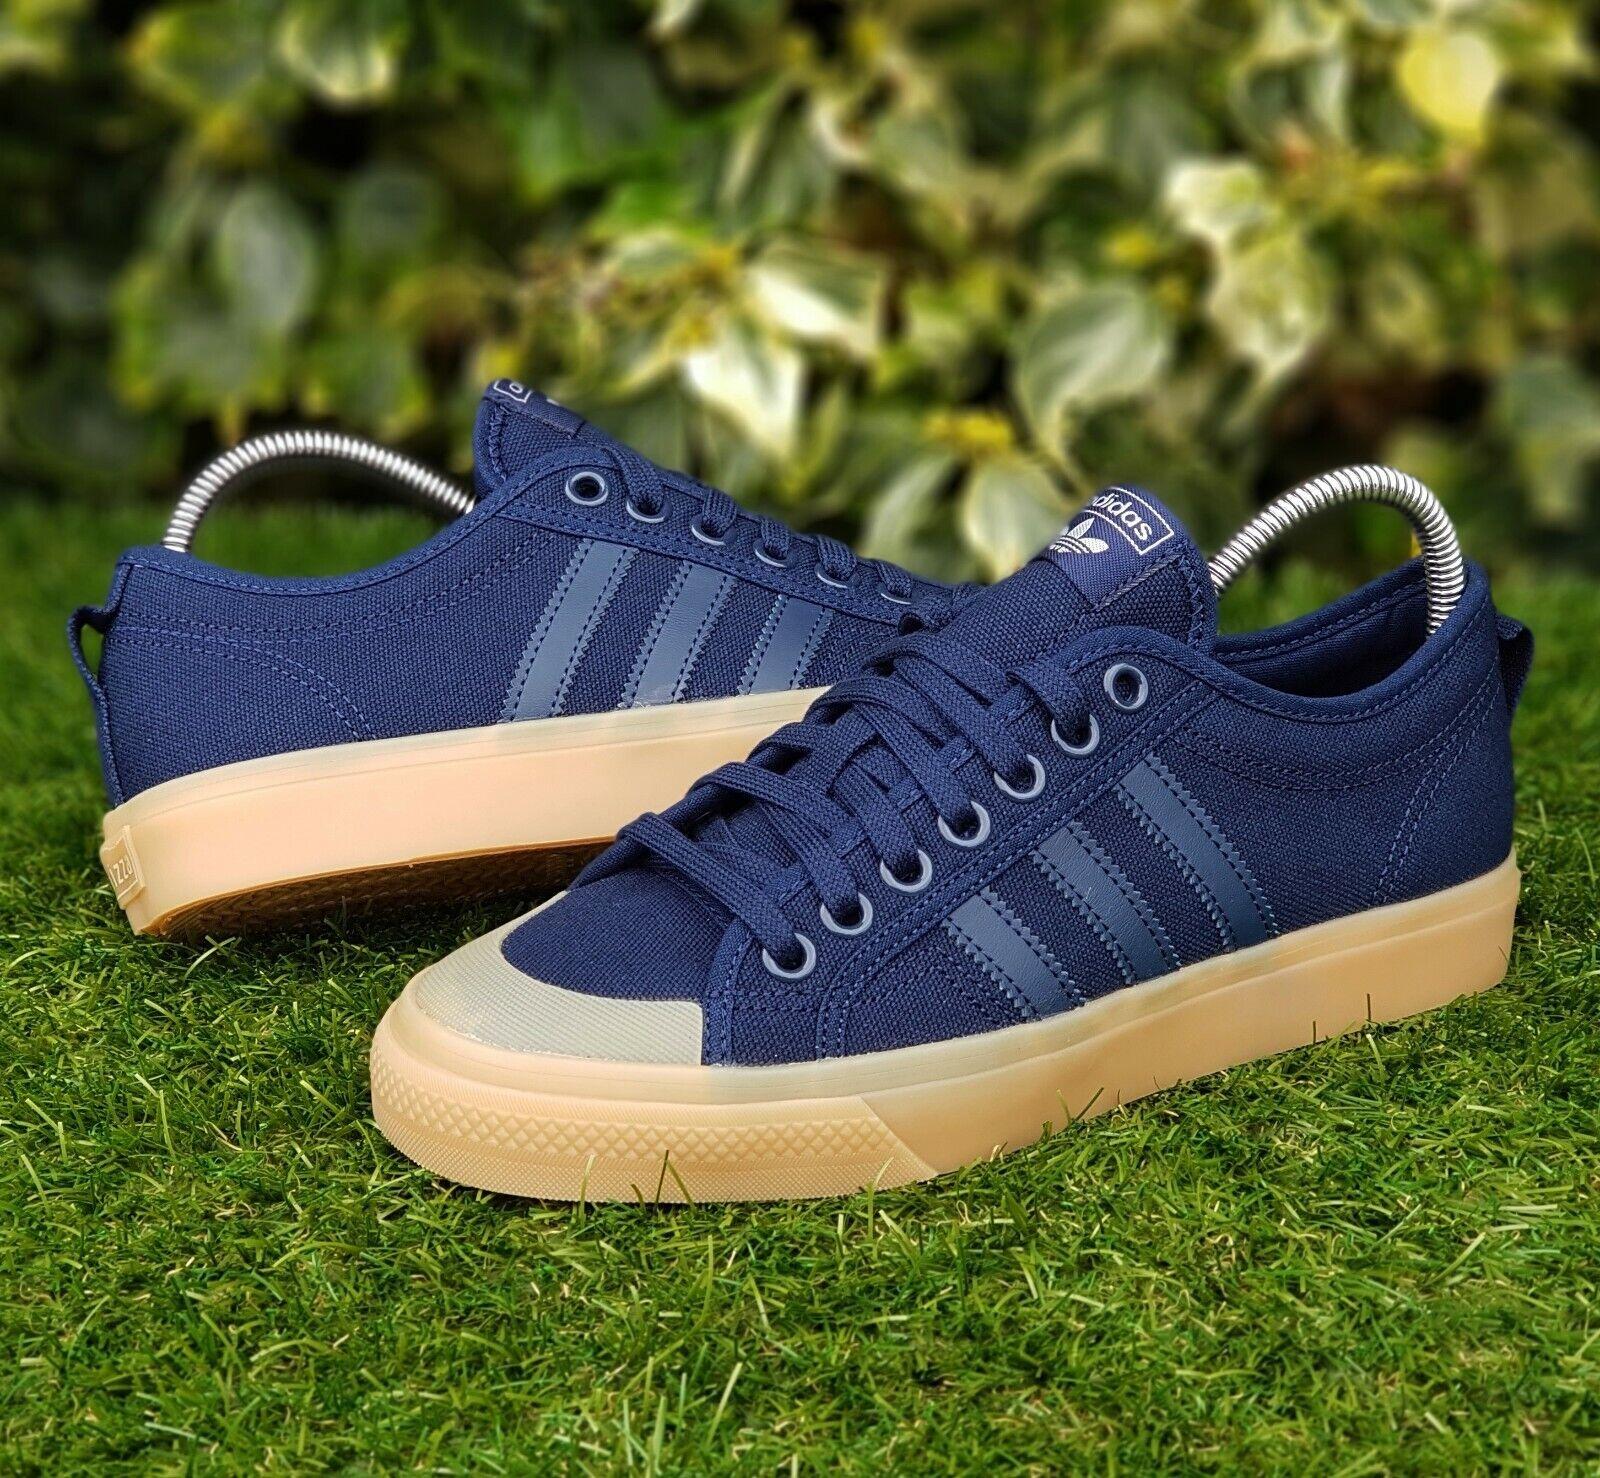 BNWB & Authentc adidas originals ® Nizza Lo Navy bluee & Gum Trainers UK Size 9.5